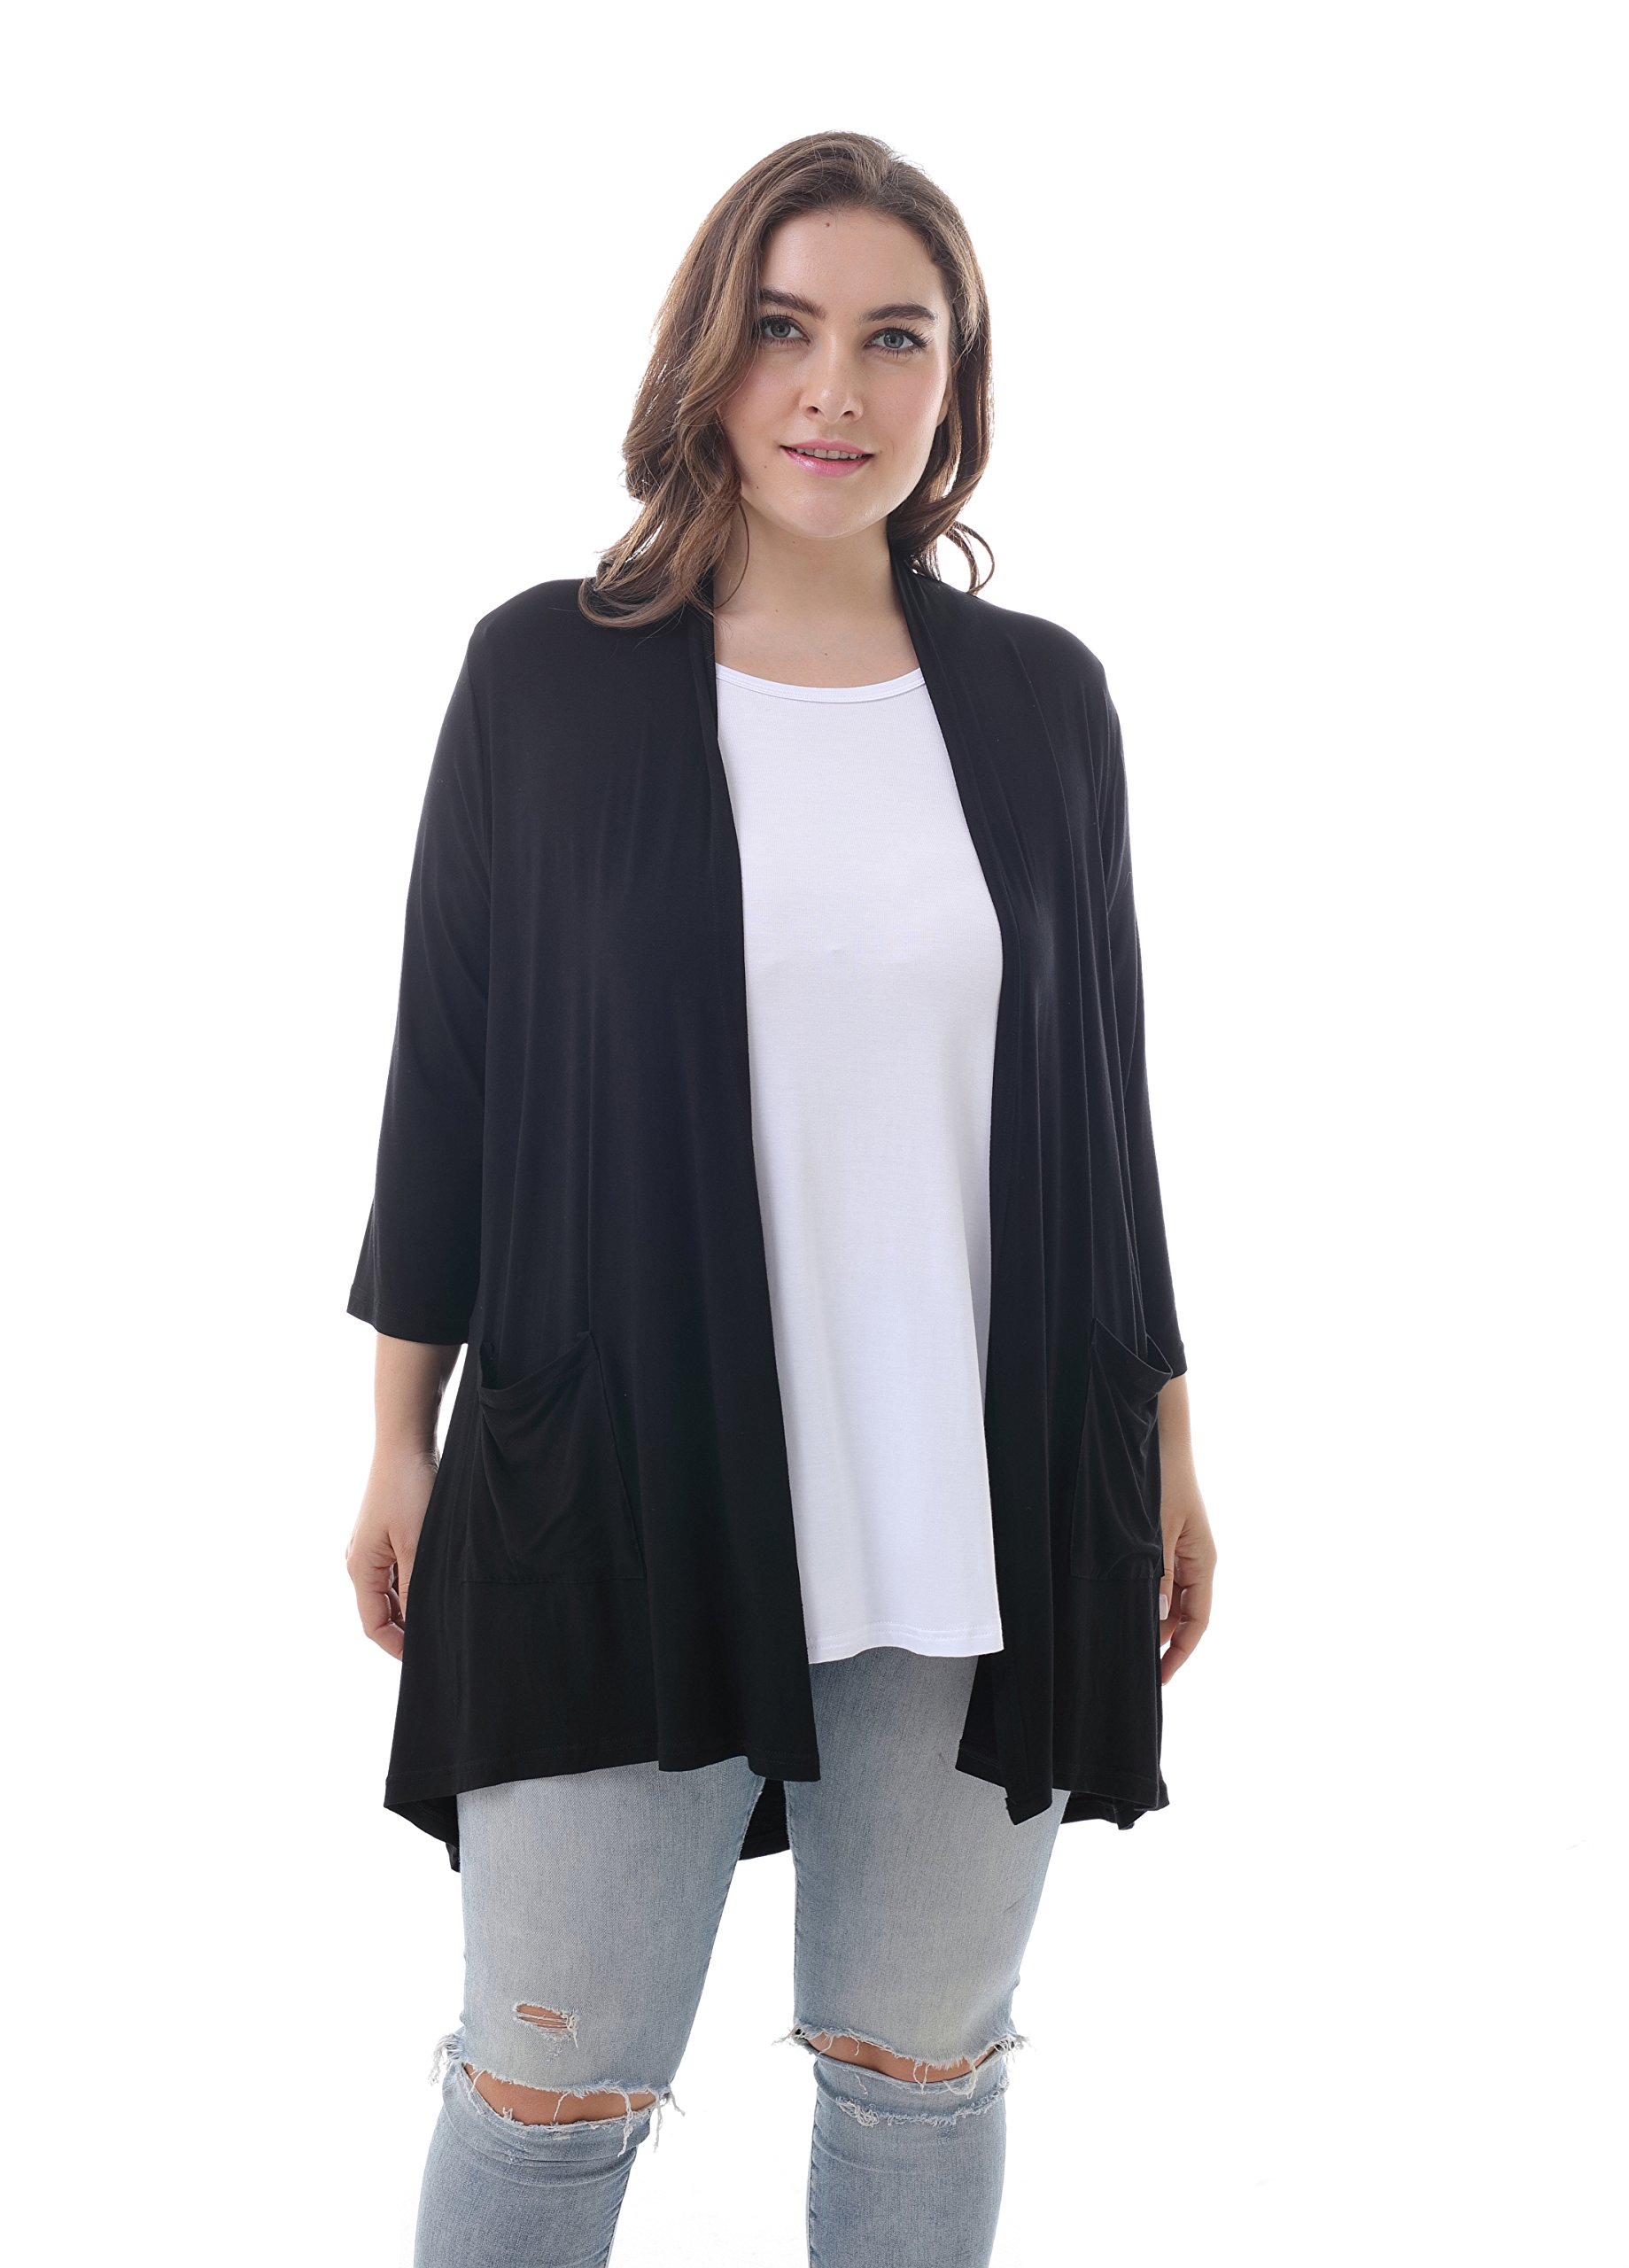 ZERDOCEAN Women's Plus Size 3/4 Sleeve Lightweight Soft Printed Drape Cardigan with Pockets Black 2X